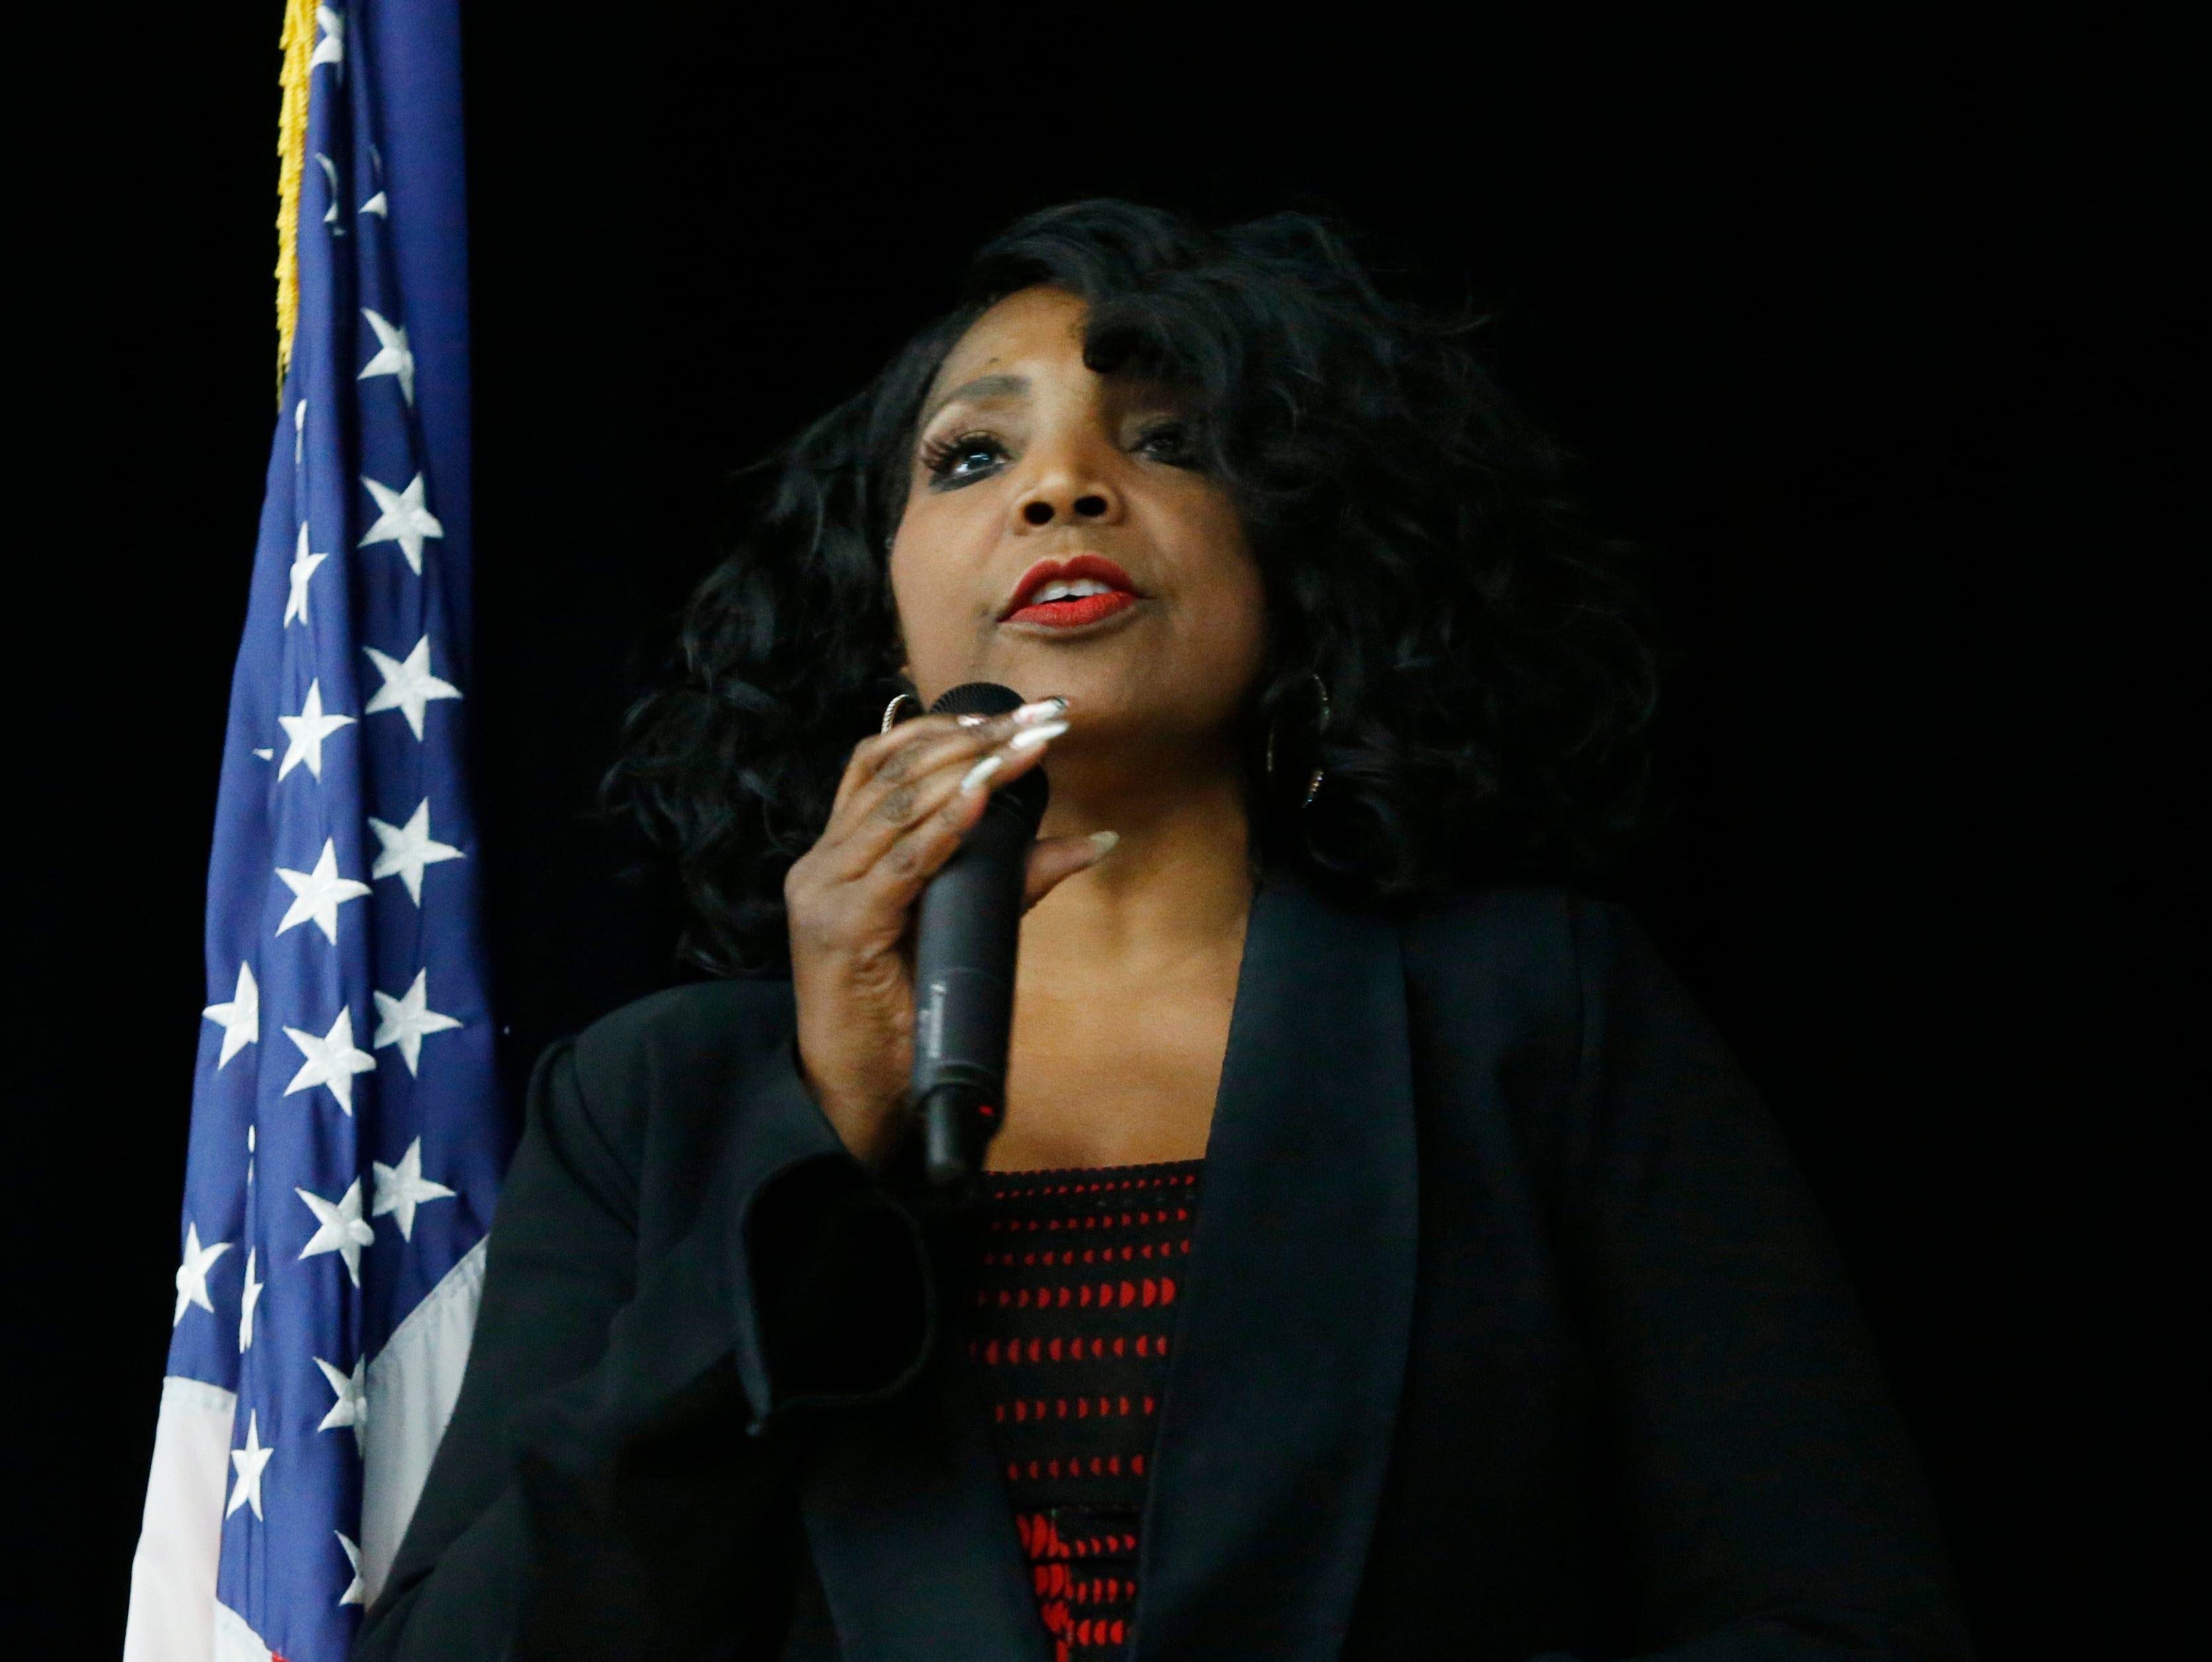 Poughkeepsie City School District school board president, Felicia Watson speaks during Thursday's Martin Luther King Celebration at Poughkeepsie High School on February 14, 2019.